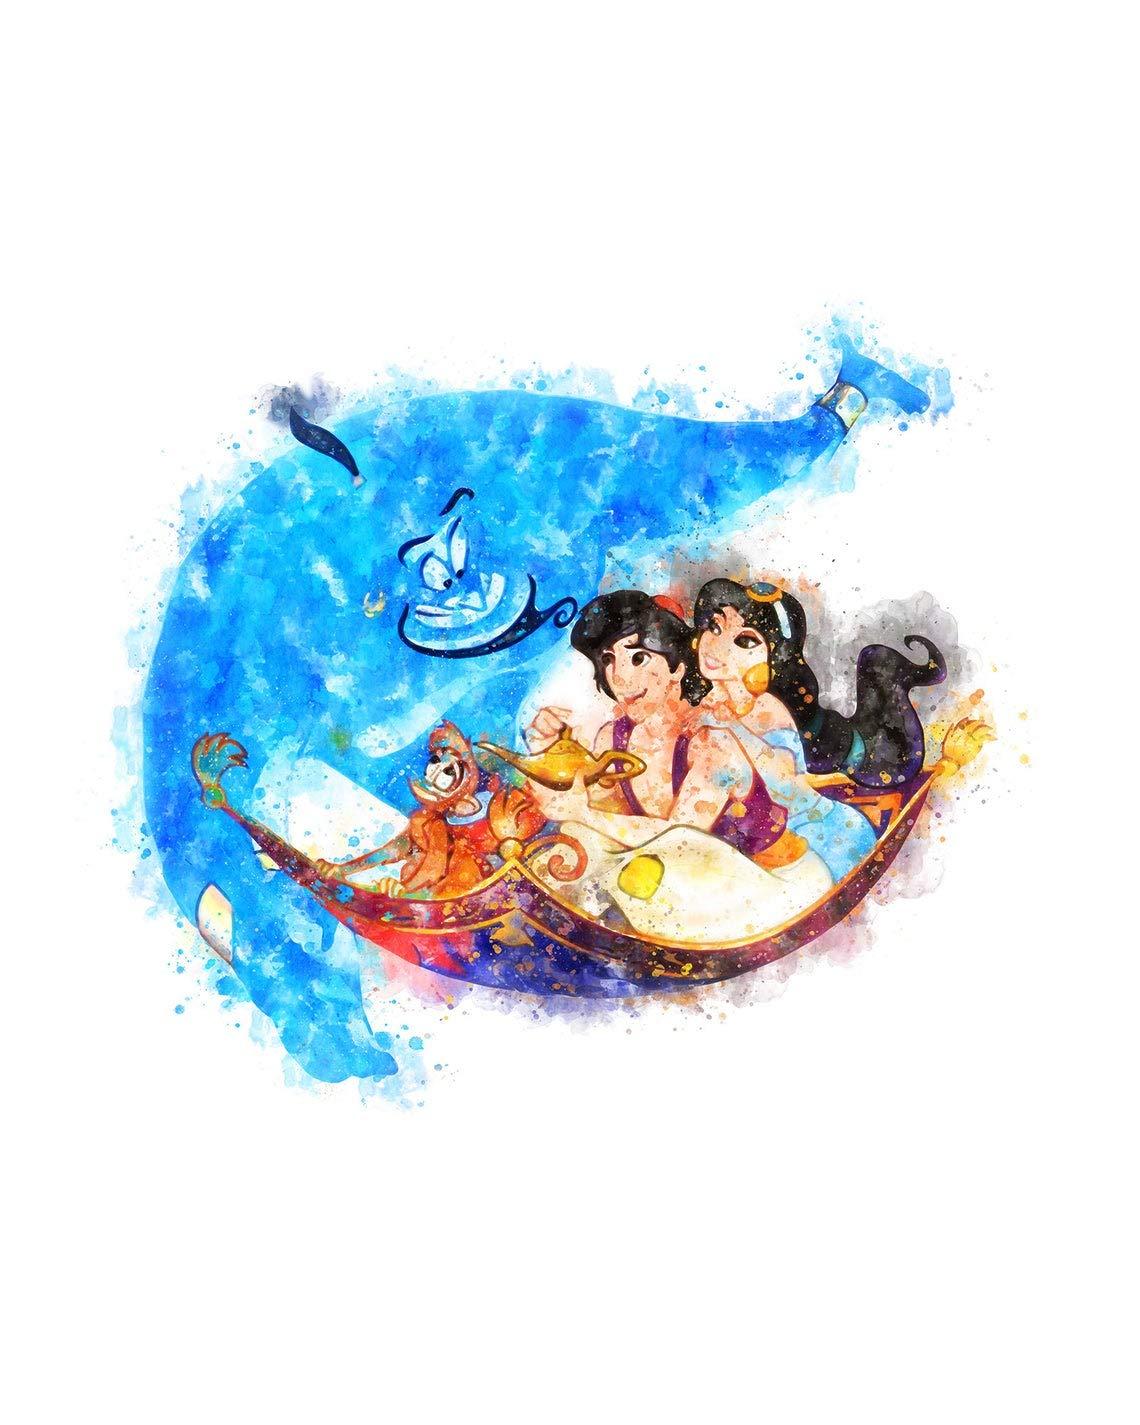 Aladdin and Jasmine Wall Art Disney Watercolor Poster Home Decor UNFRAMED